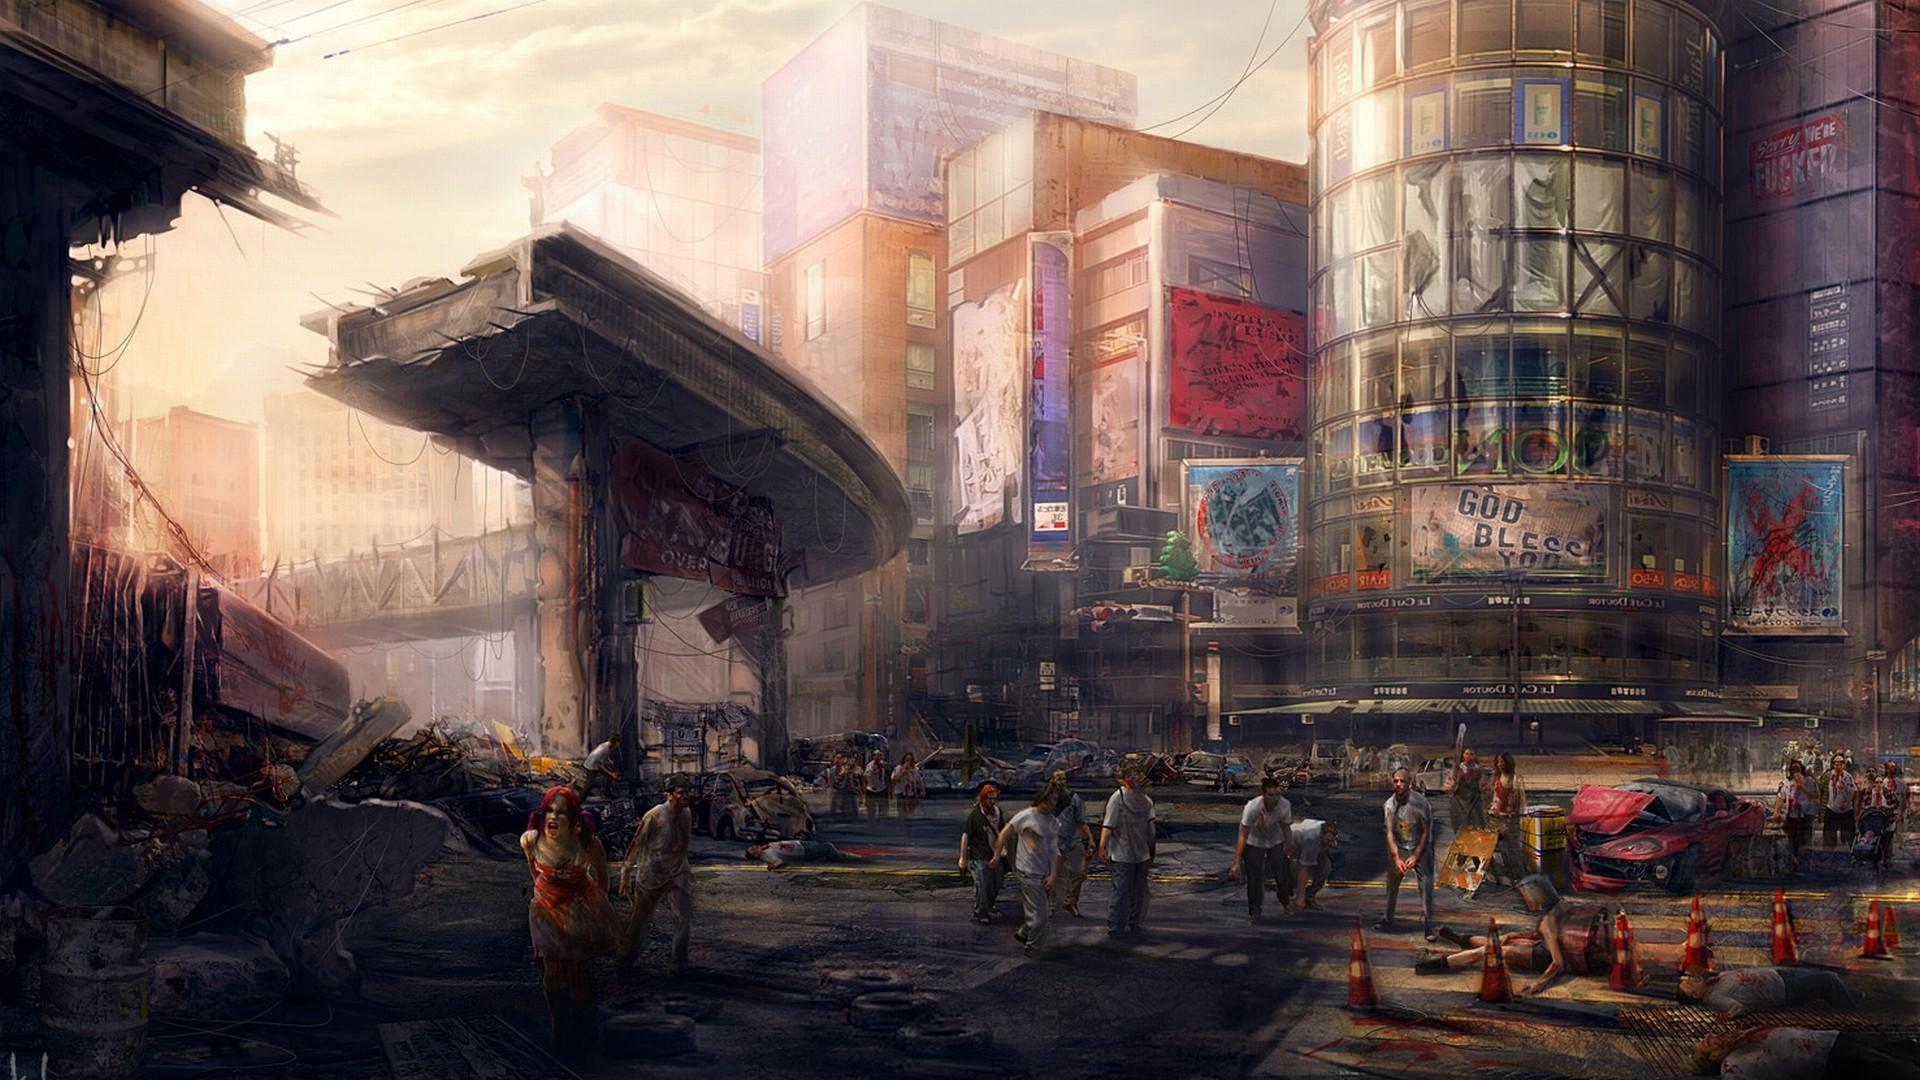 zombie apocalypse Wallpaper Background | 20608